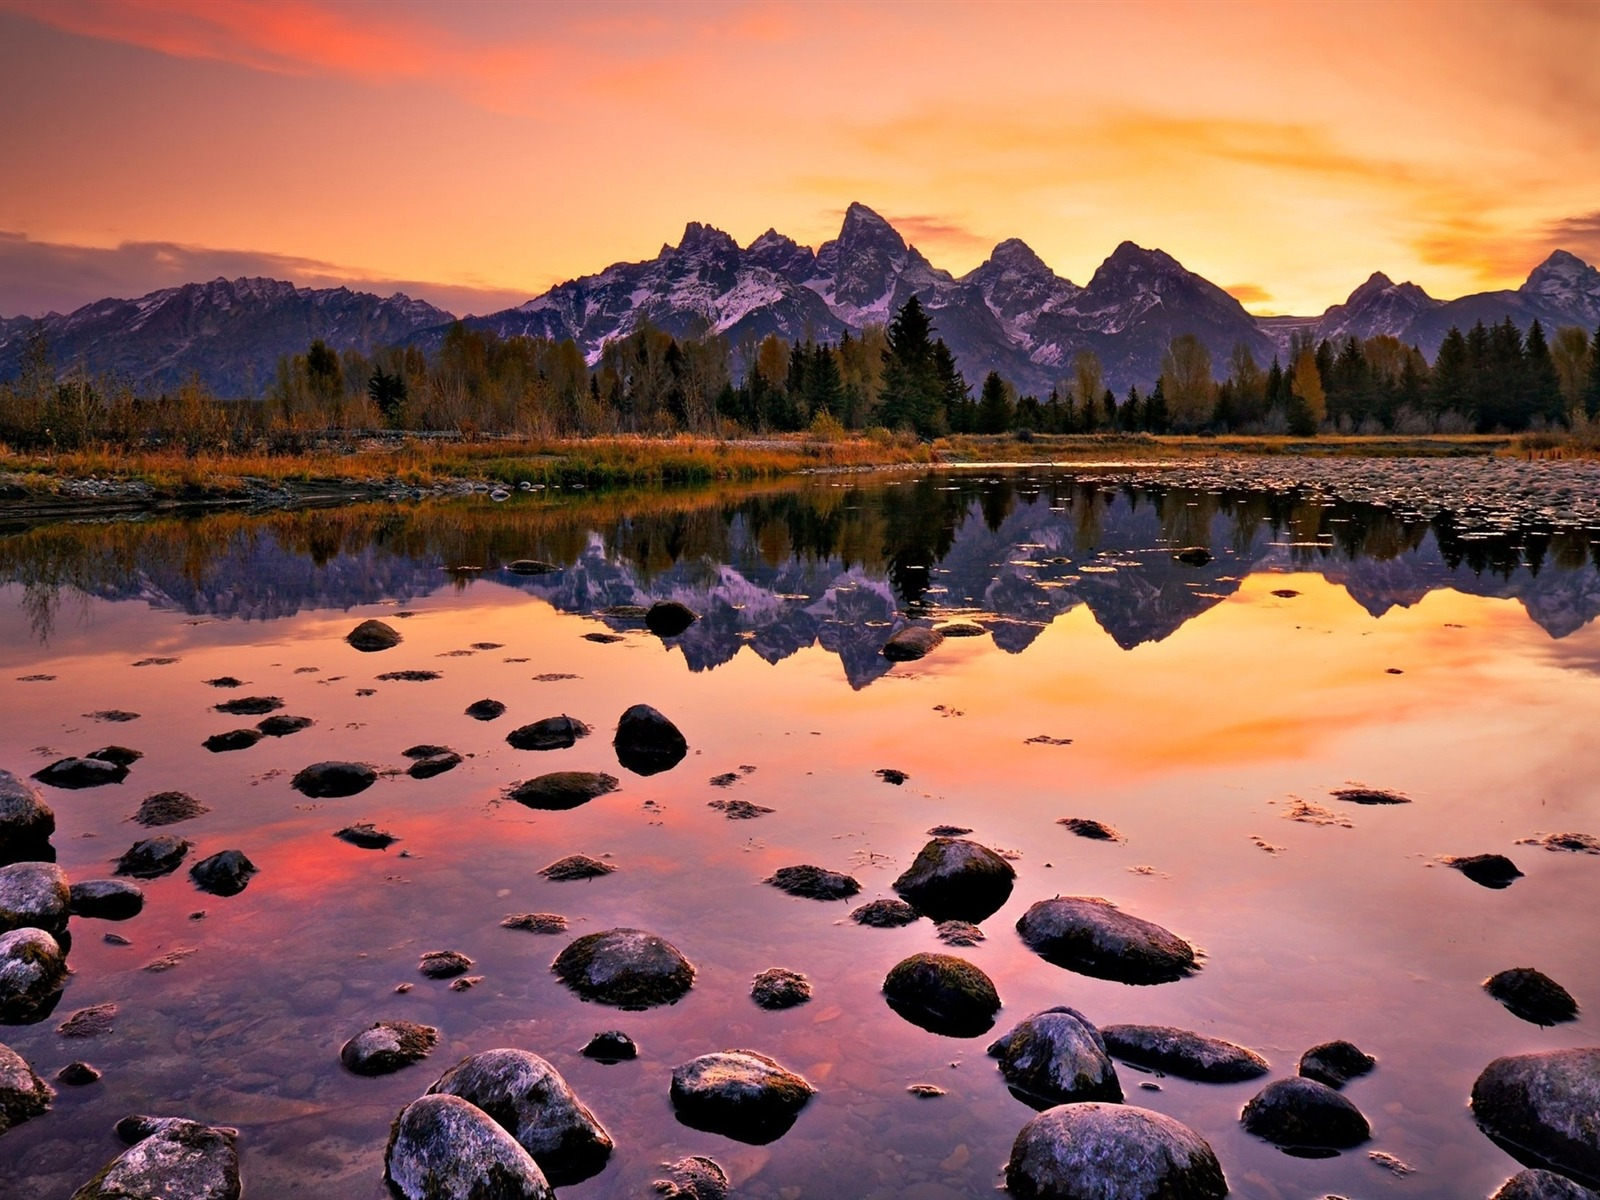 Sunset Grand Teton National Park Nature Photography Hd